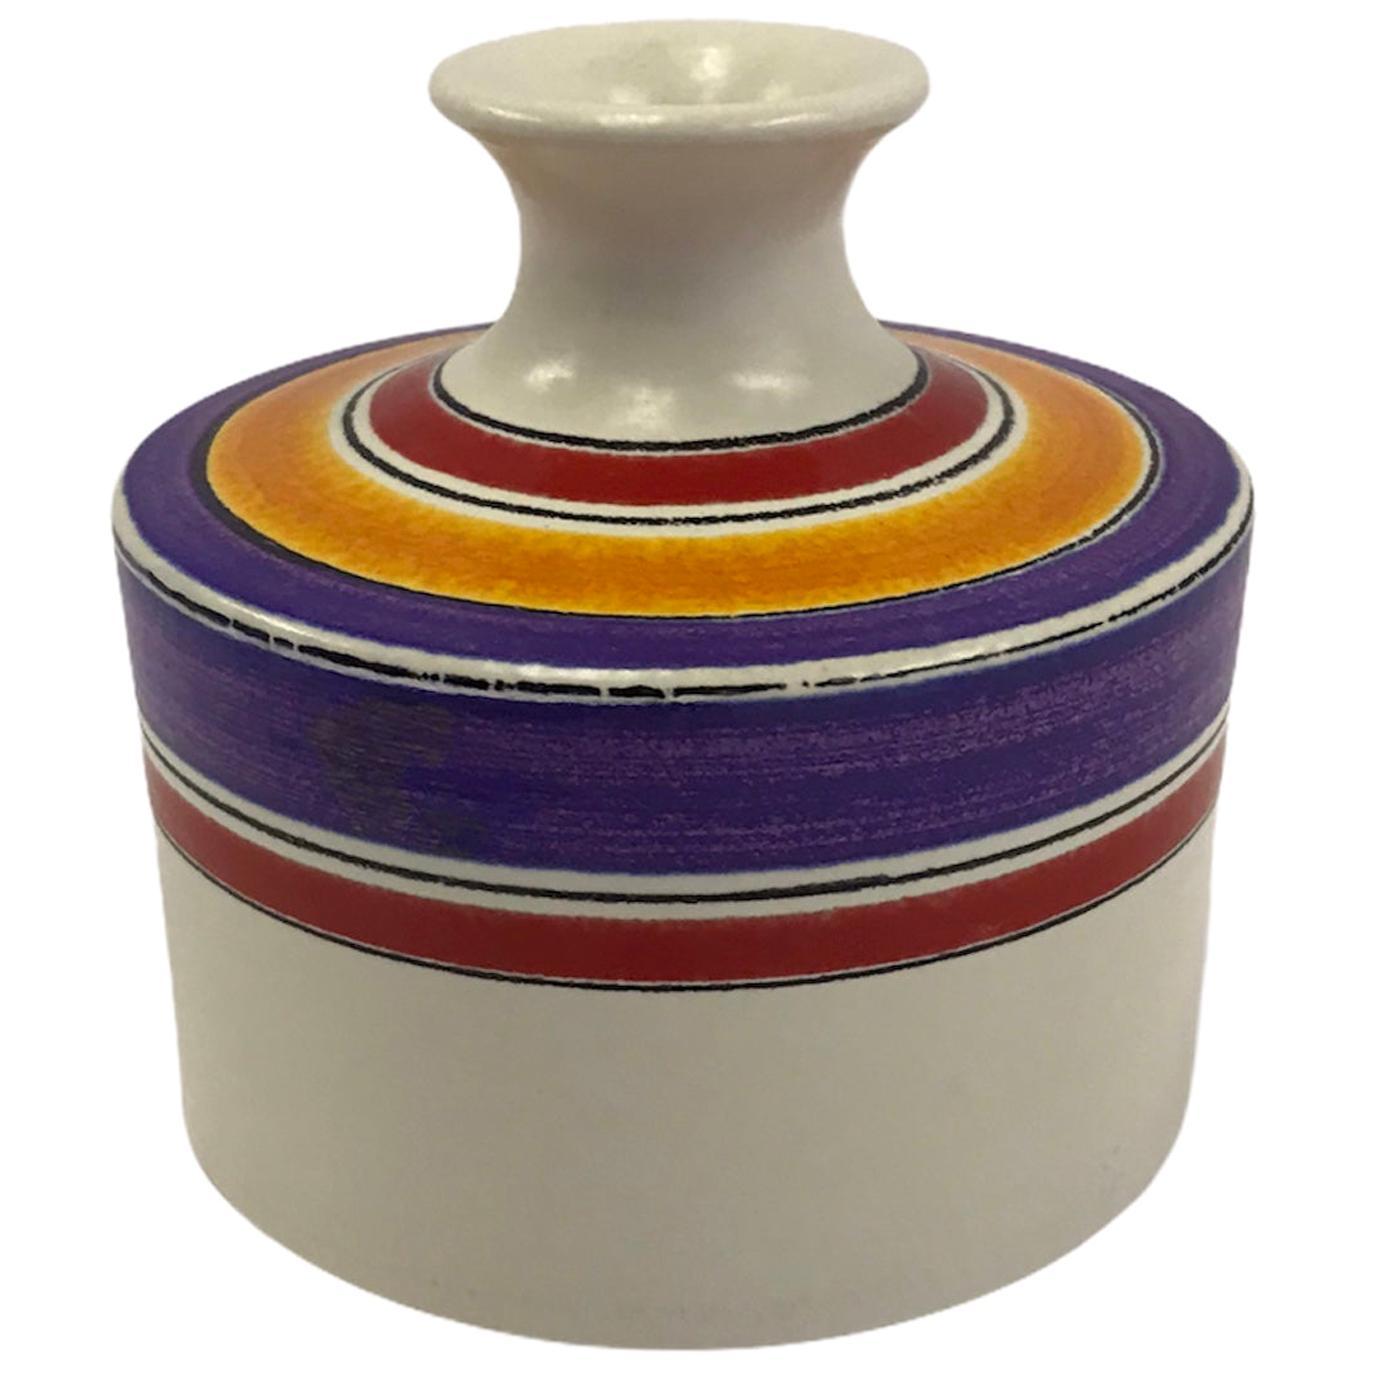 Fascie Colorate Ceramic Vase by Aldo Londi for Rosenthal Netter Bitossi, 1970s